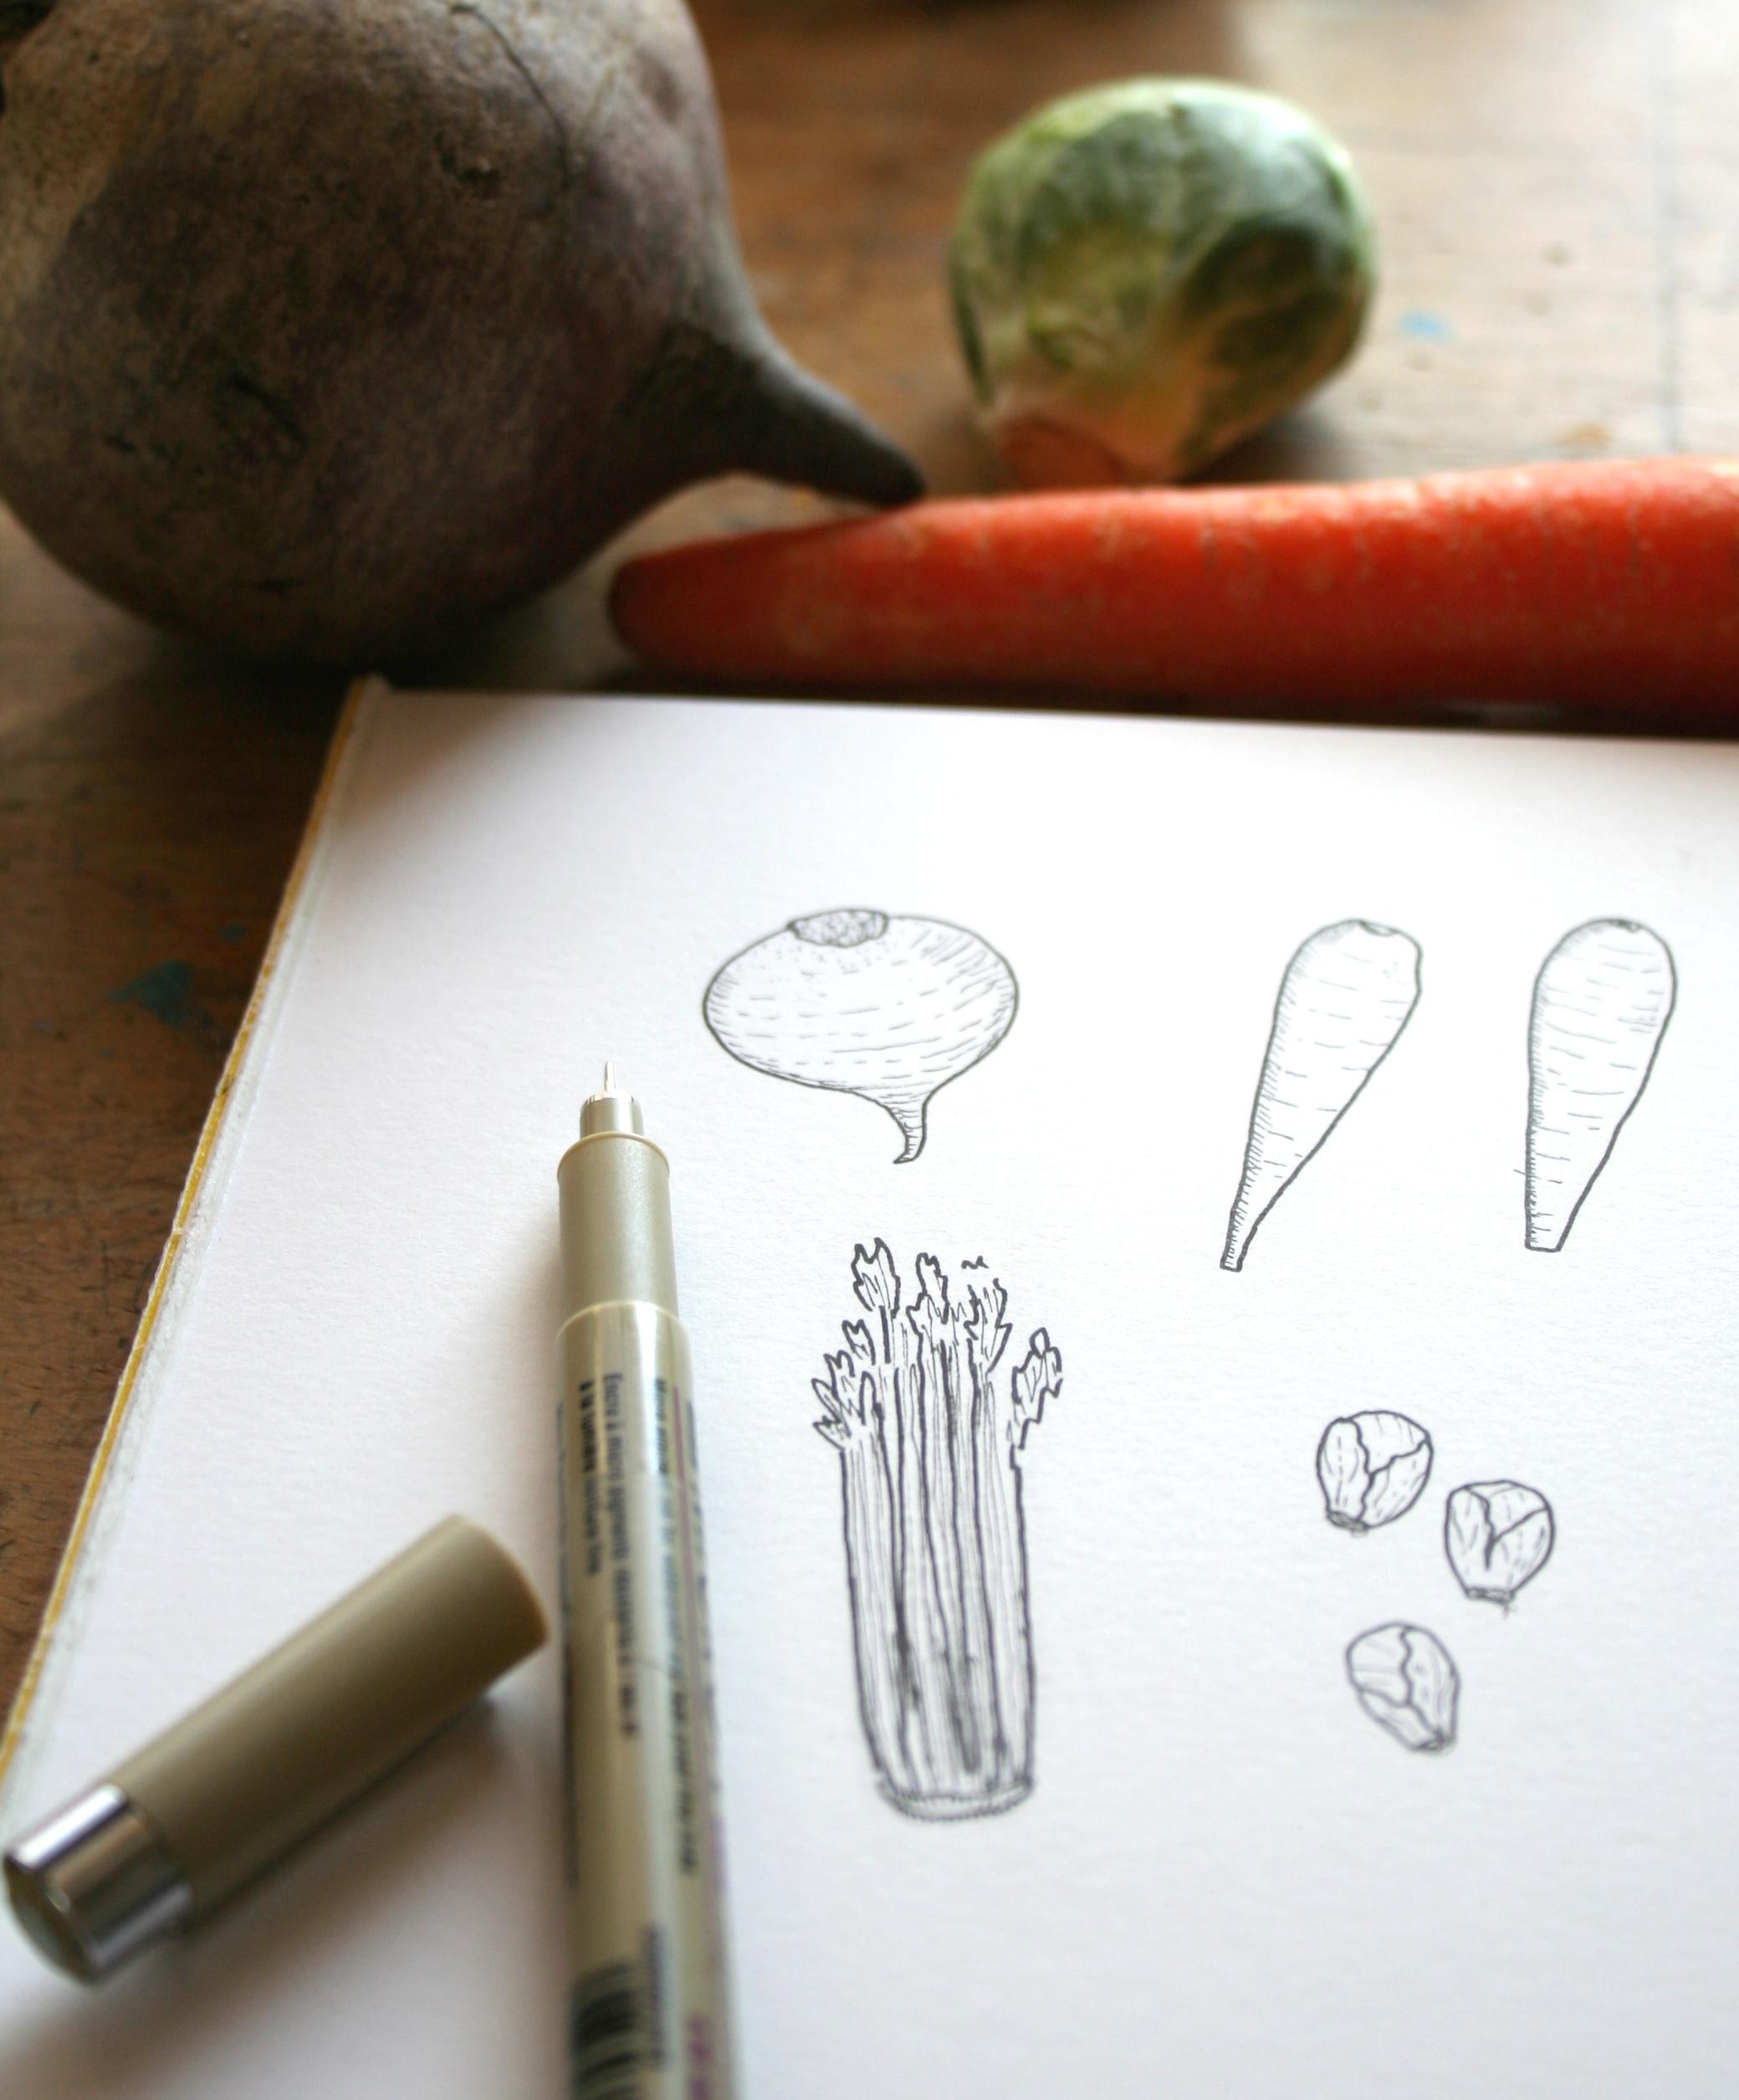 Drawn vegetable veggie Vegetables How Draw Art Vegetables